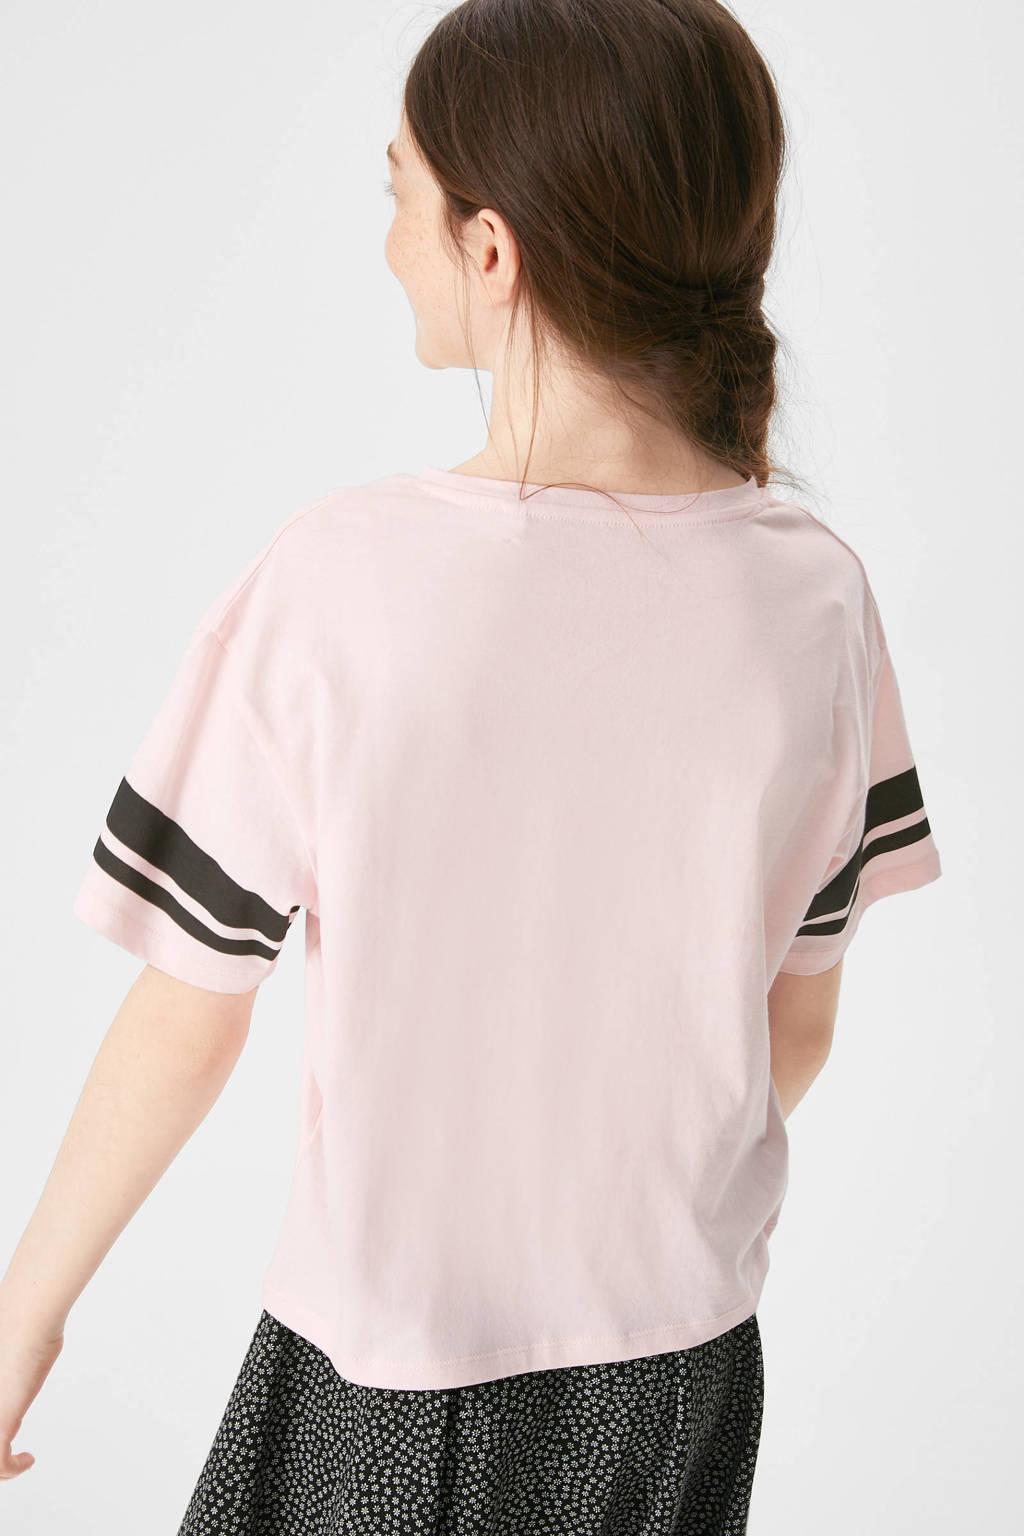 C&A Here & There T-shirt van biologisch katoen lichtroze/zwart, Lichtroze/zwart